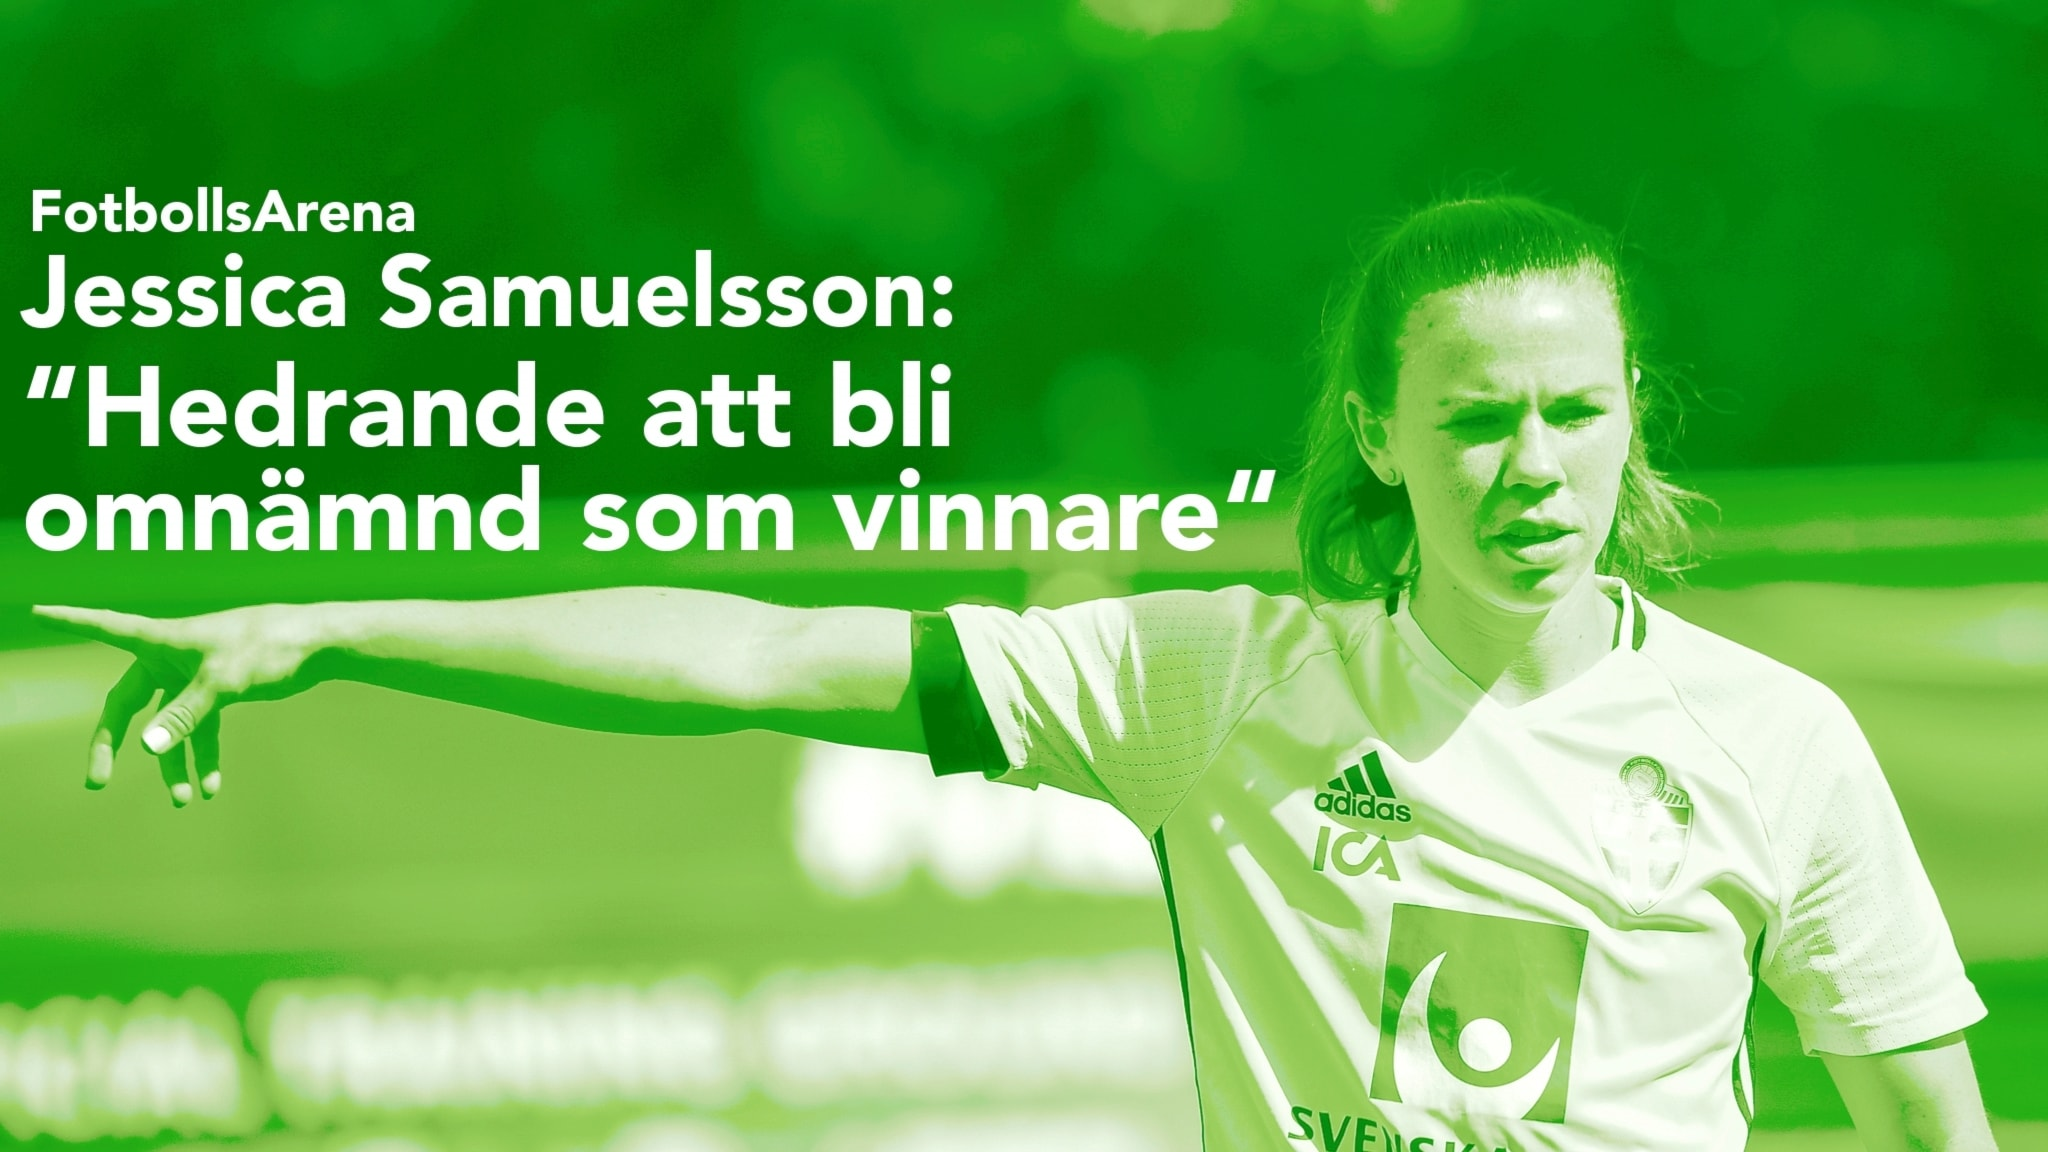 Jessica Samuelsson kan bli diamantbollen-vinnare